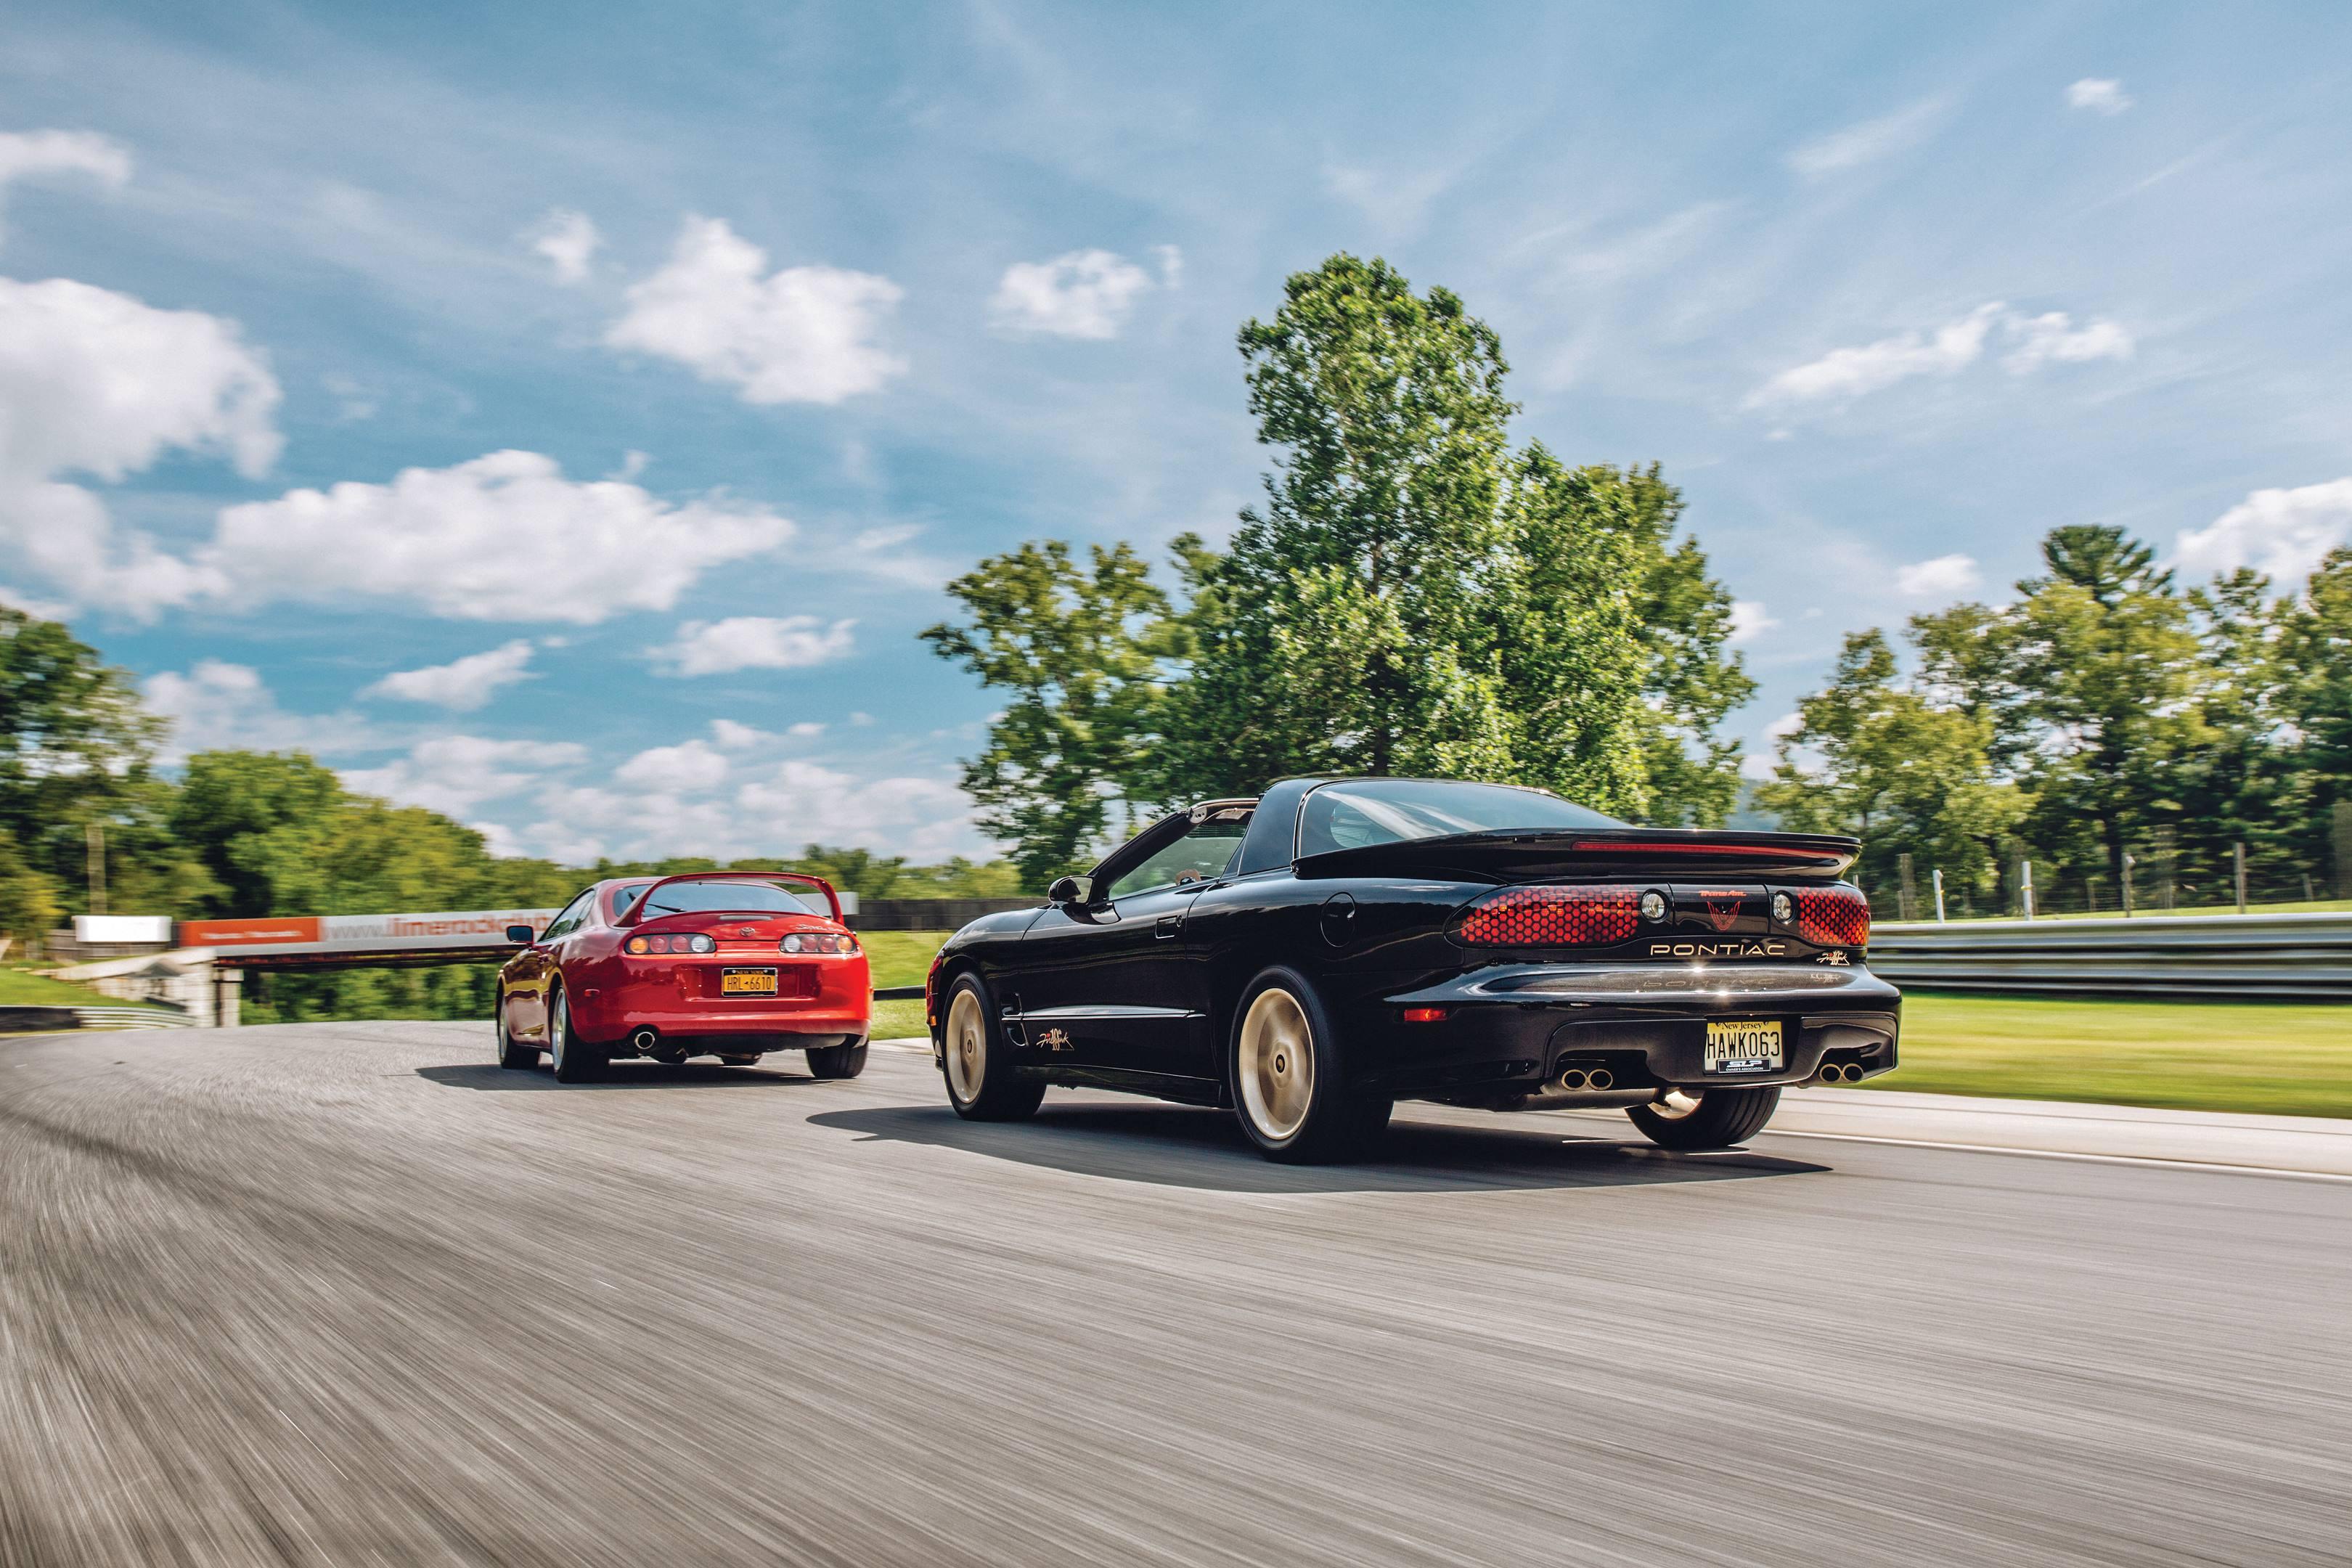 Toyota Supra Turbo and Pontiac Firebird Firehawk